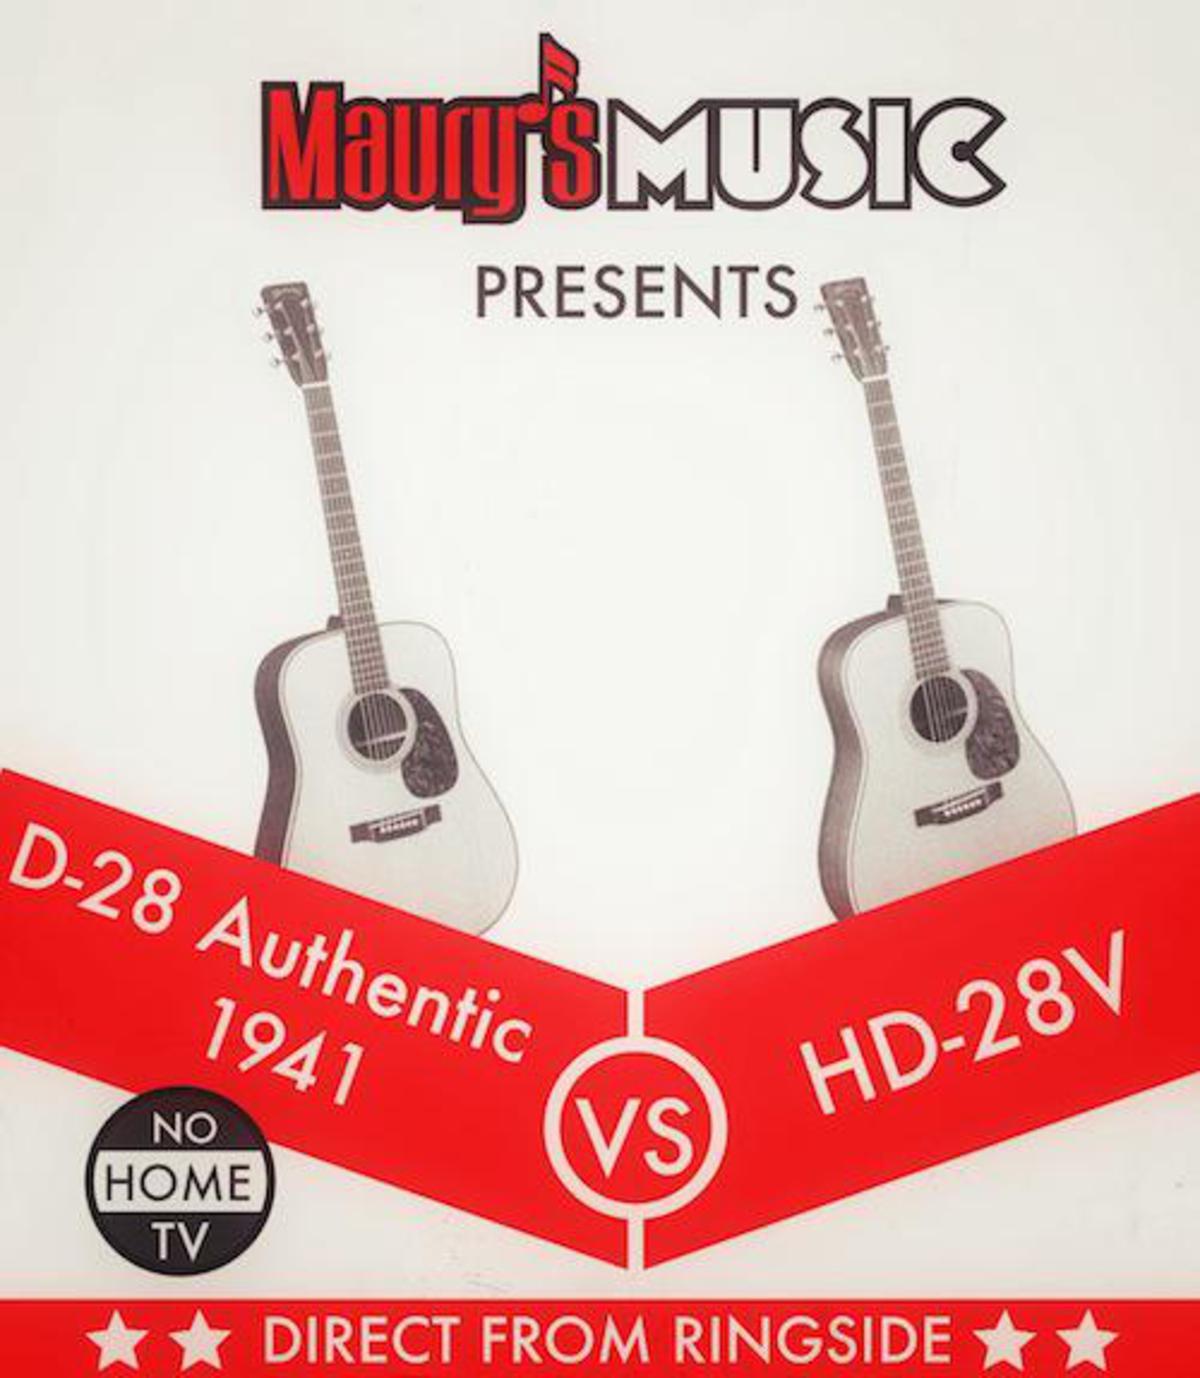 Martin HD-28V vs the D-28 Authentic 1941